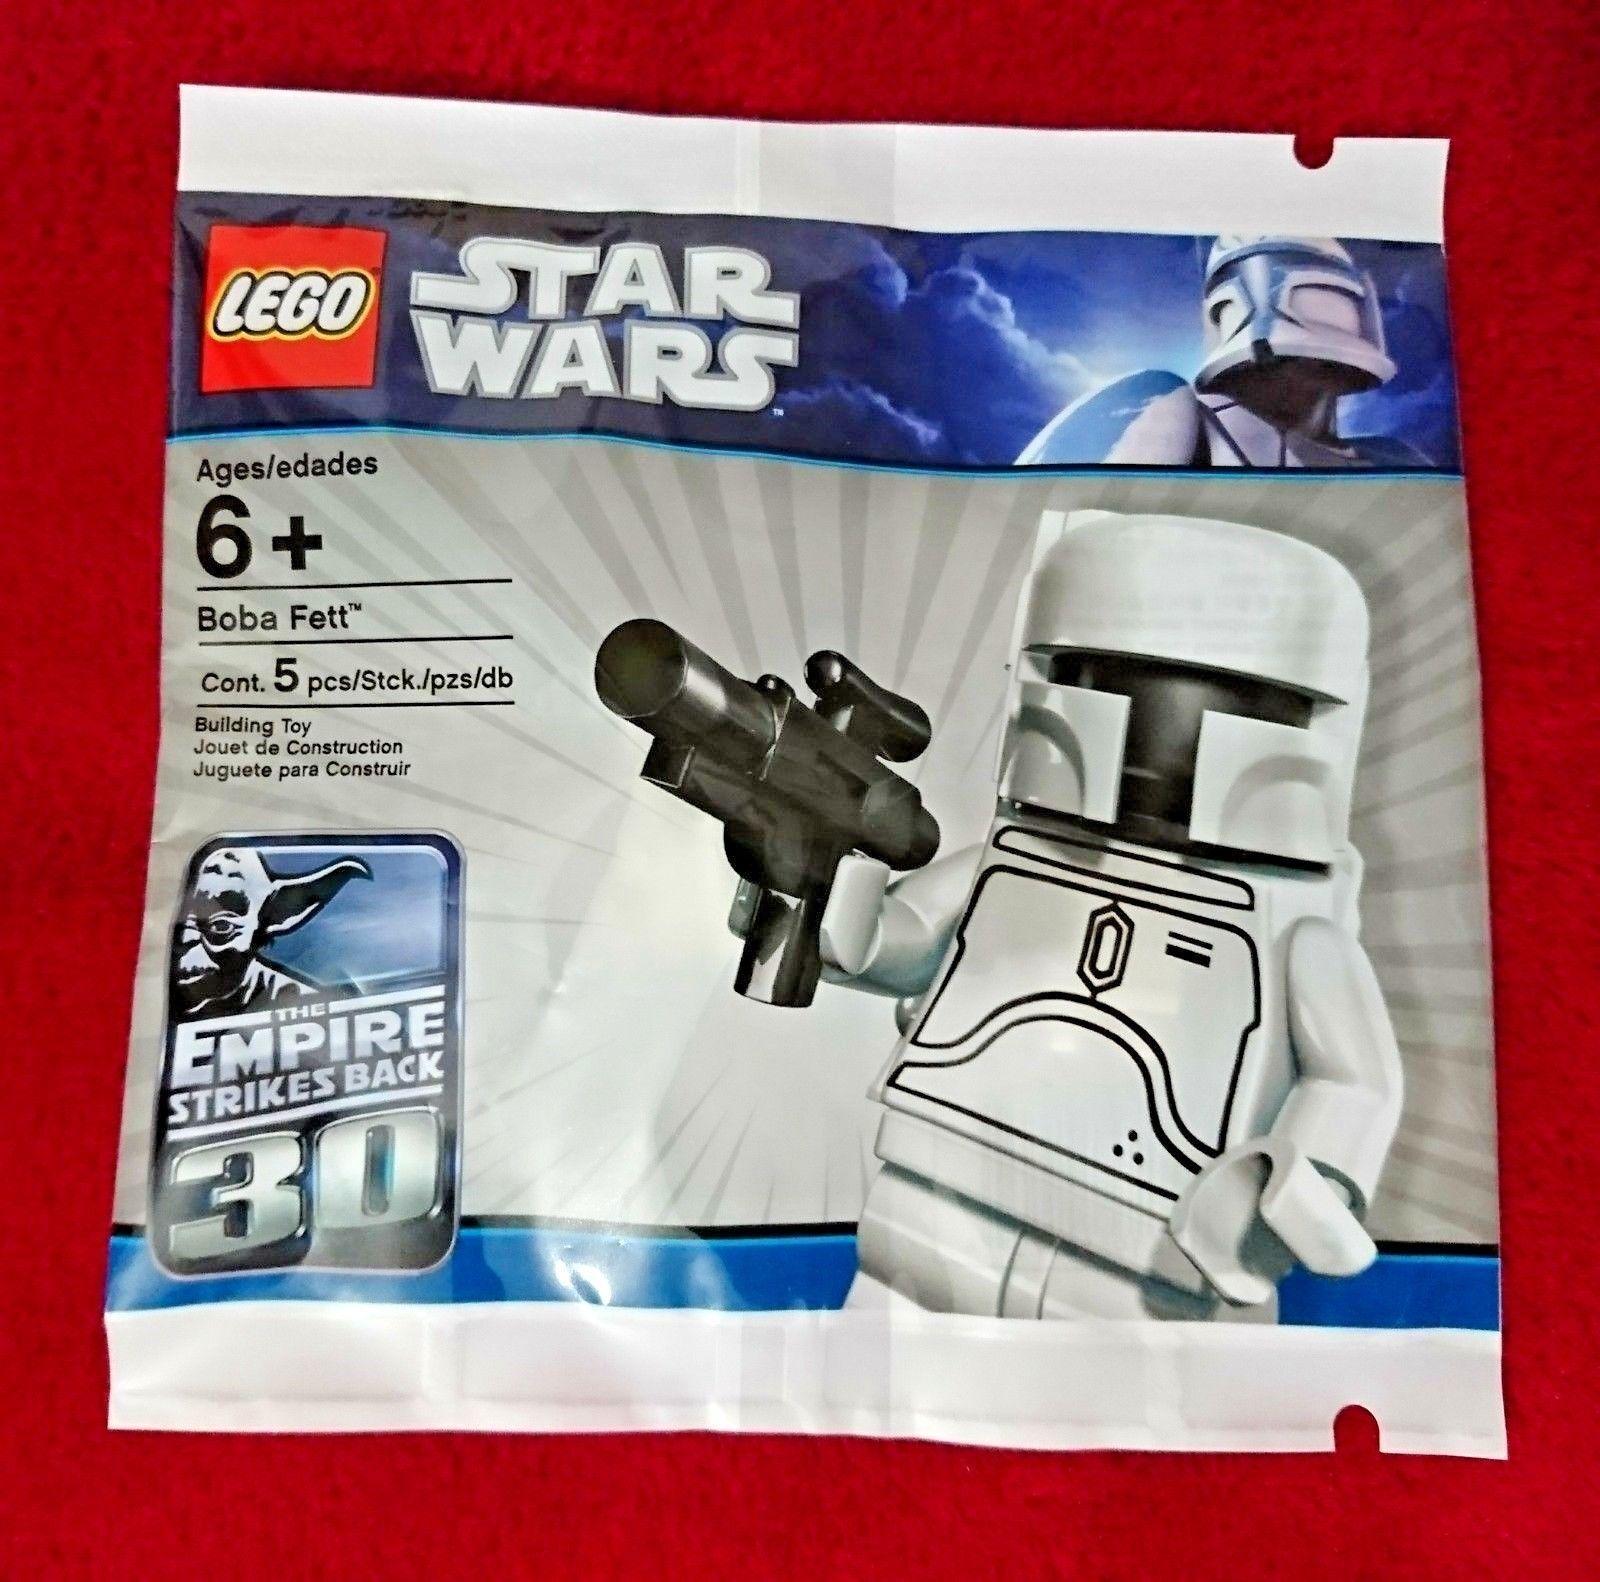 Star Wars Lego    WHITE BOBA FETT  LIMITED EDITION 4597068 Factory Sealed Polybag 9bbc5e